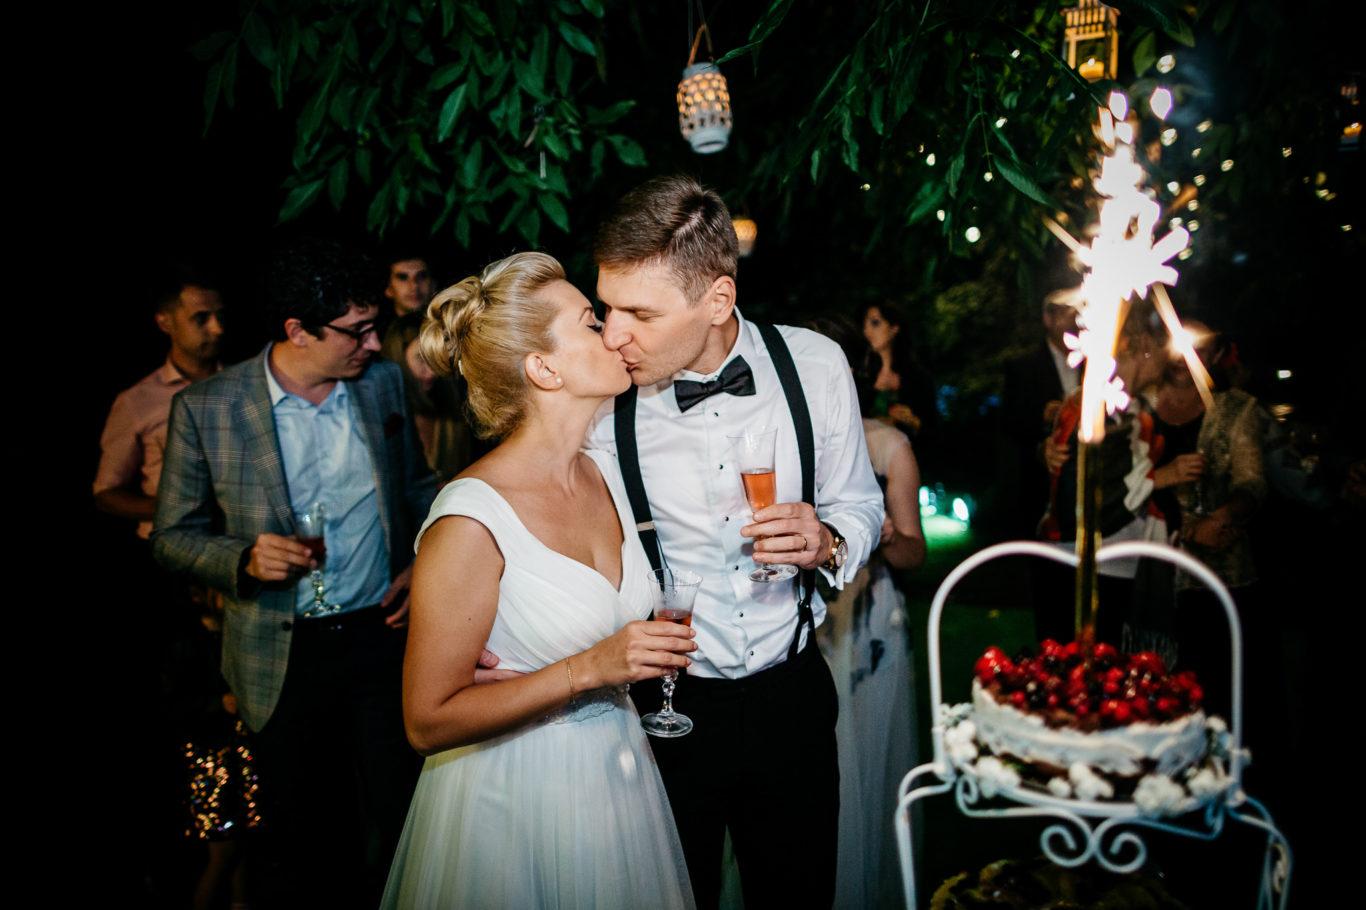 0875-fotoreportaj-nunta-conacul-maldar-cristina-stefan-fotograf-ciprian-dumitrescu-dc1_3545